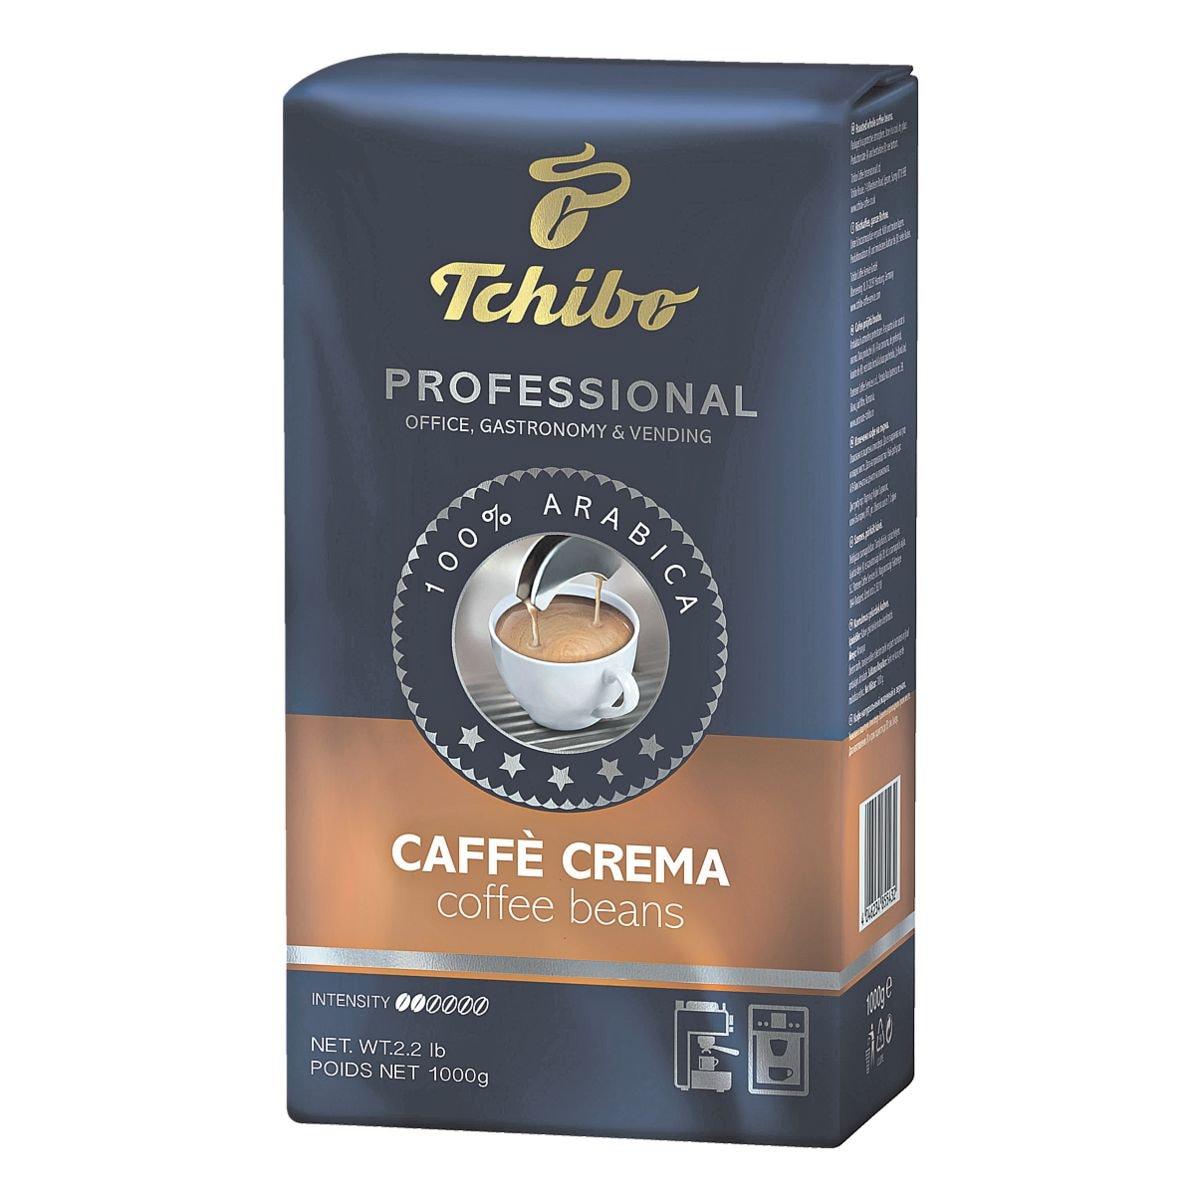 Tchibo Kaffeebohnen »Professional Caffè Crema« 1000 g